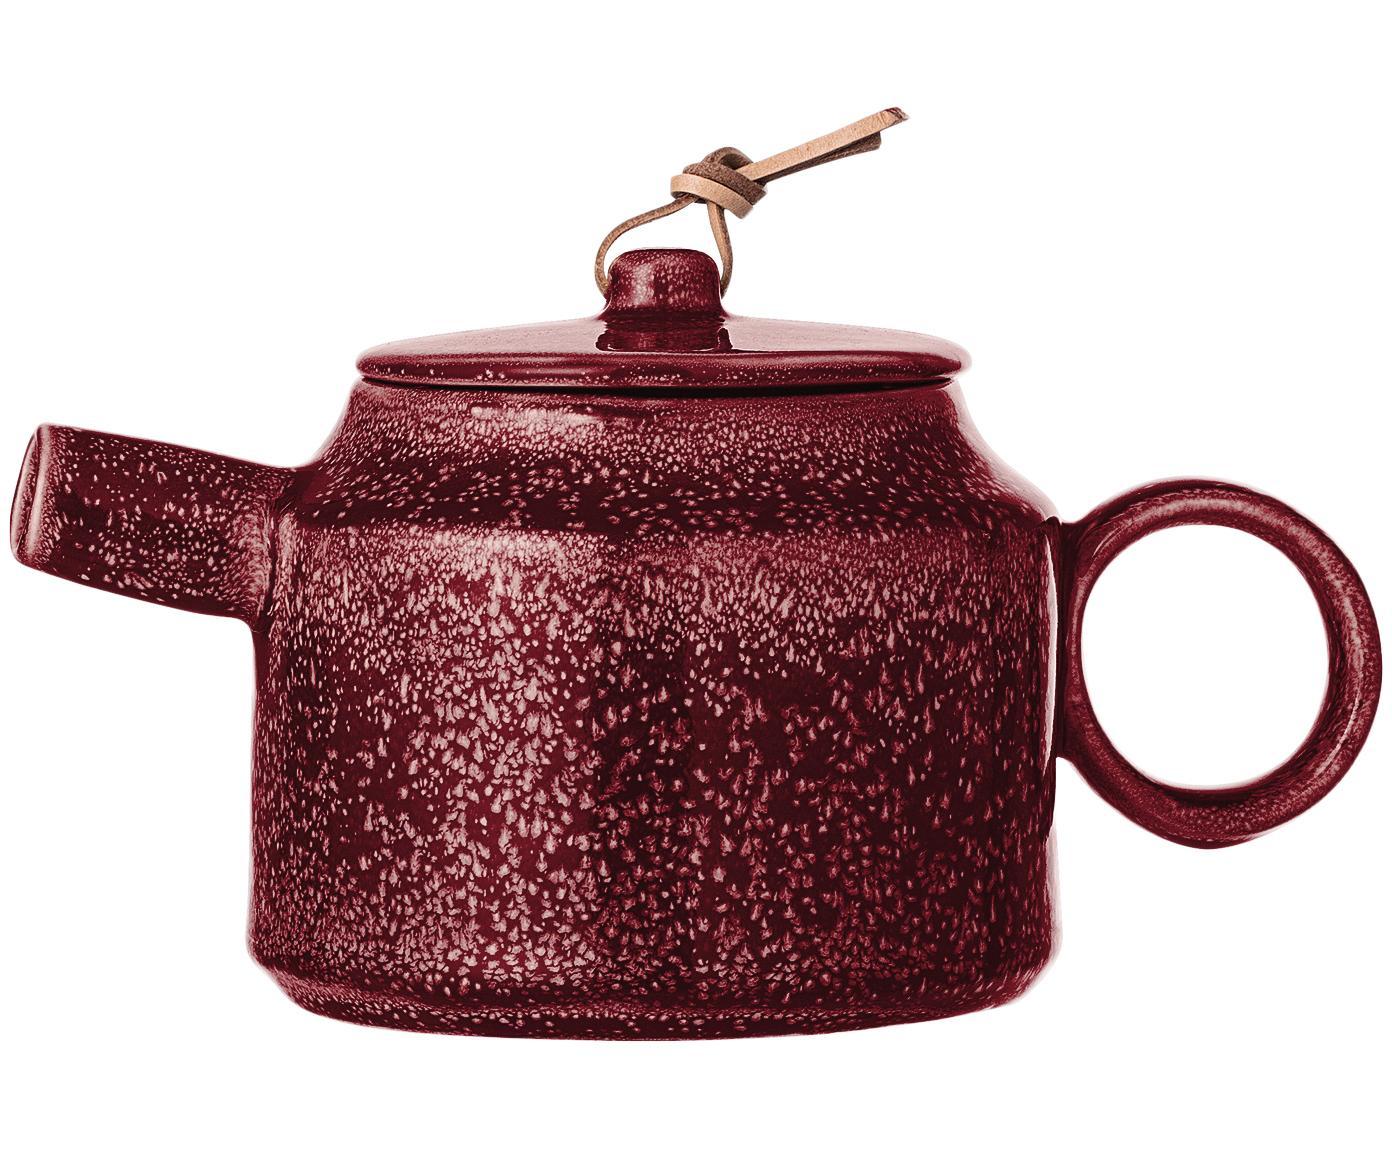 Handgefertigte Teekanne Joelle, Dunkelrot, 570 ml